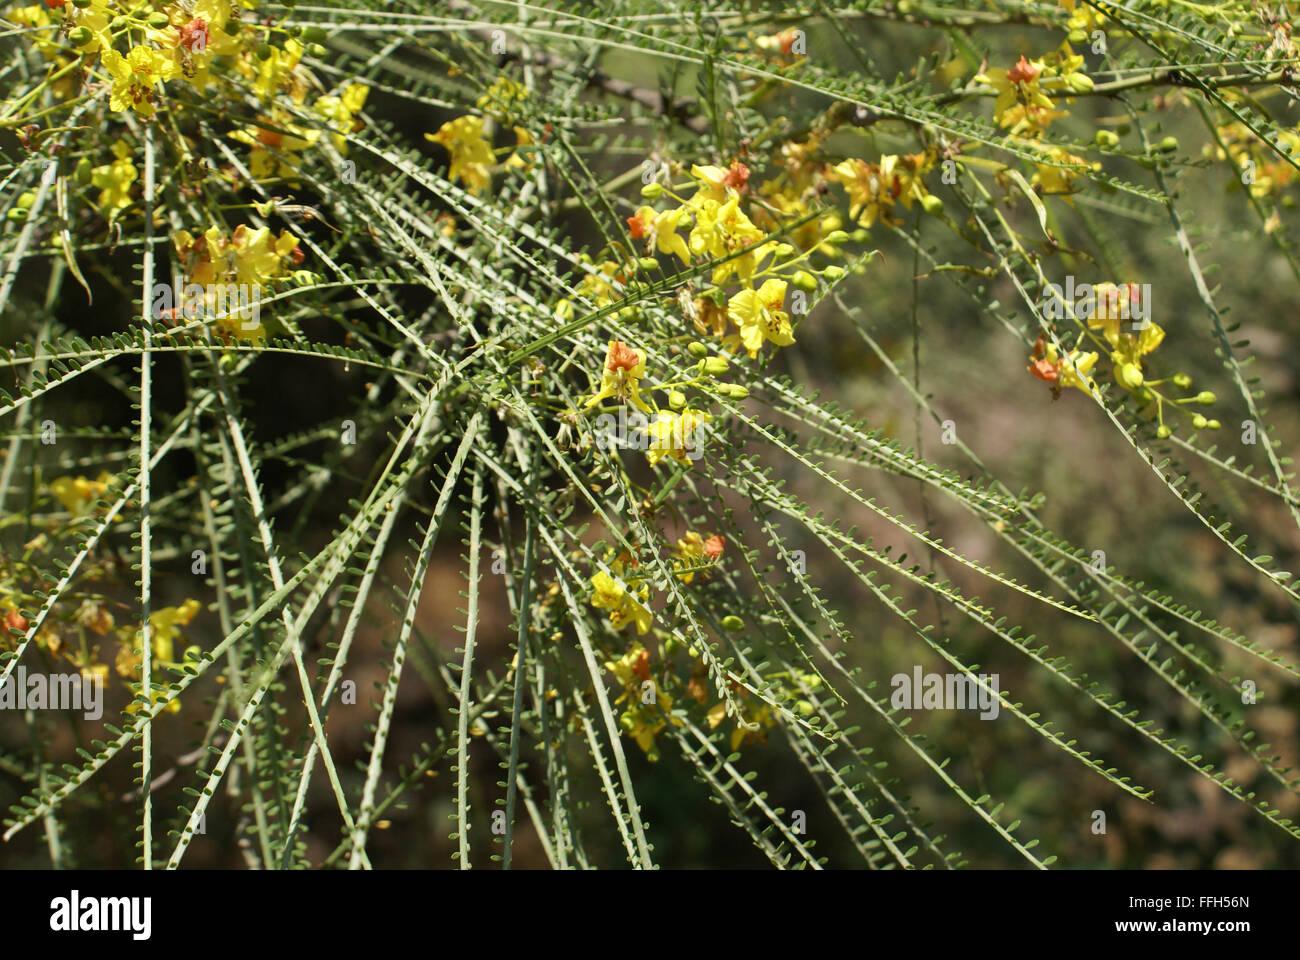 Parkinsonia Aculeata Palo Verde Spiny Shrub Or Small Tree With